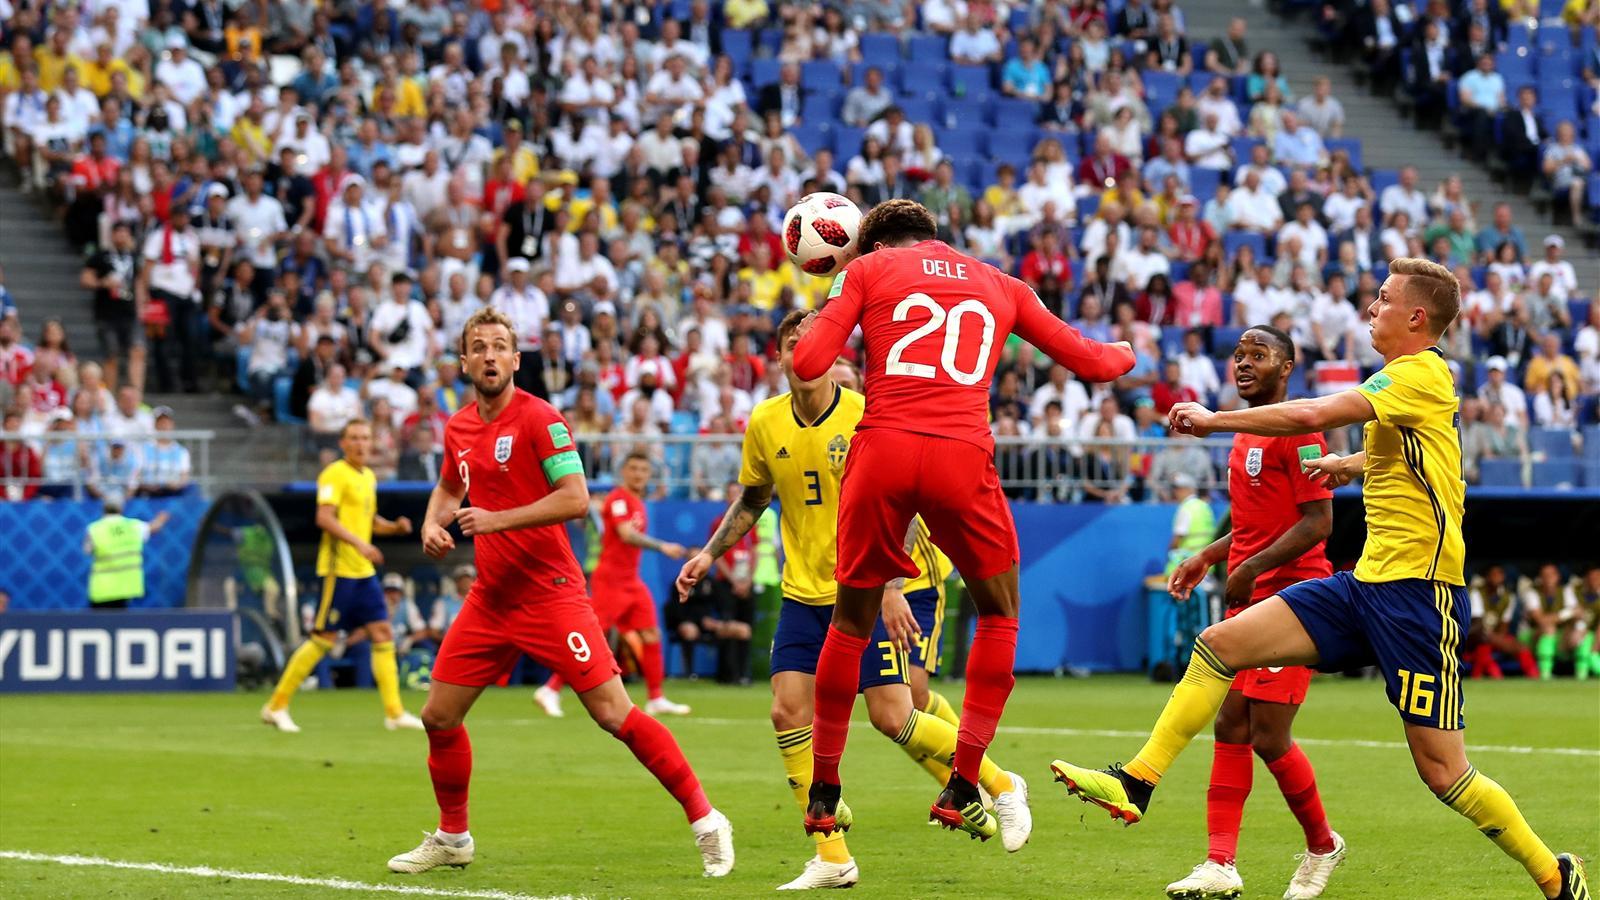 En direct live su de angleterre coupe du monde 7 juillet 2018 eurosport - Classement coupe d angleterre ...